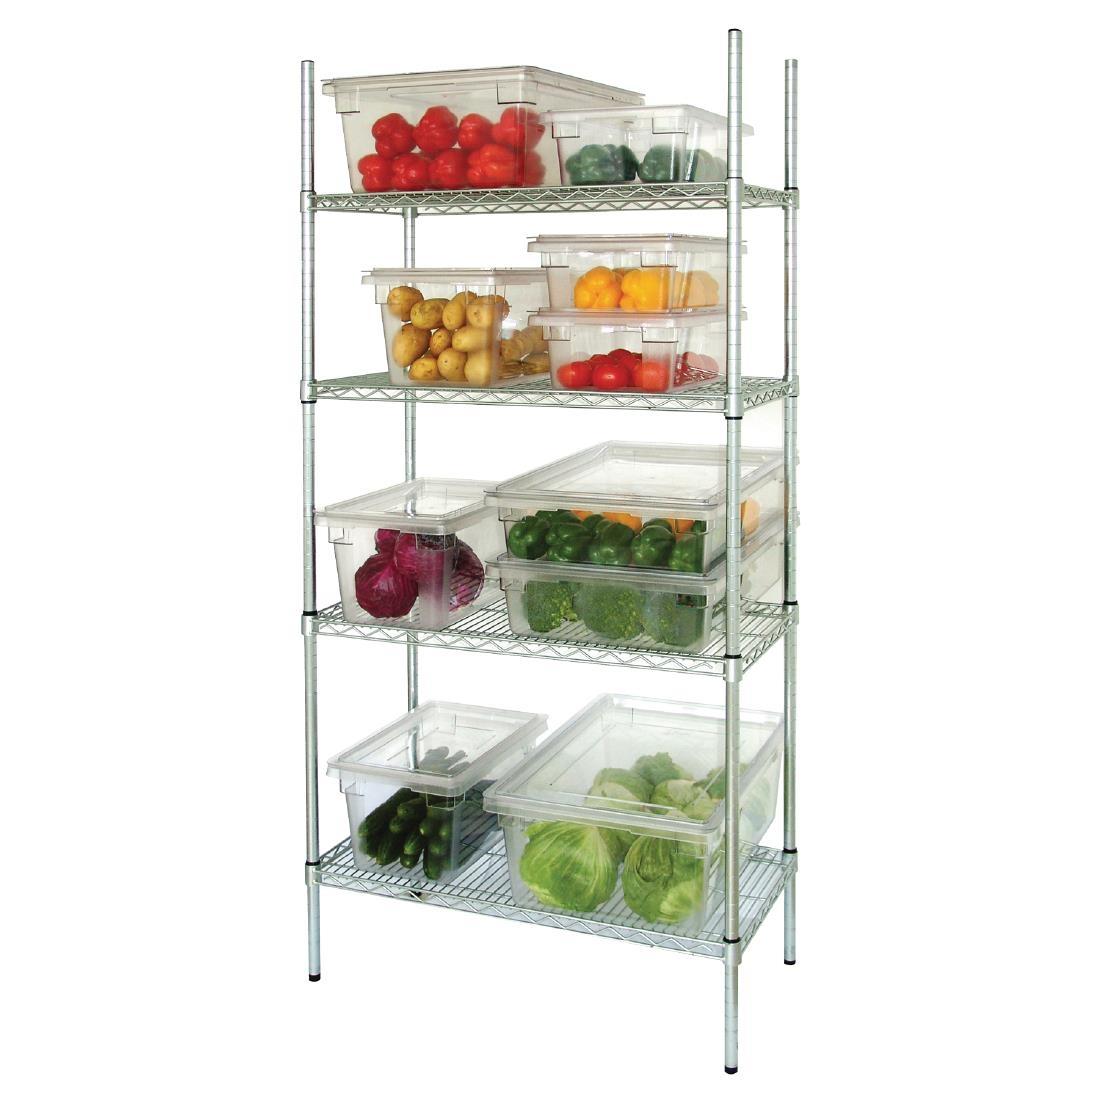 Vogue 4 Tier Wire Shelving Kit 915 X 460mm Commercial Kitchen Storage Shelves 5050984064111 Ebay